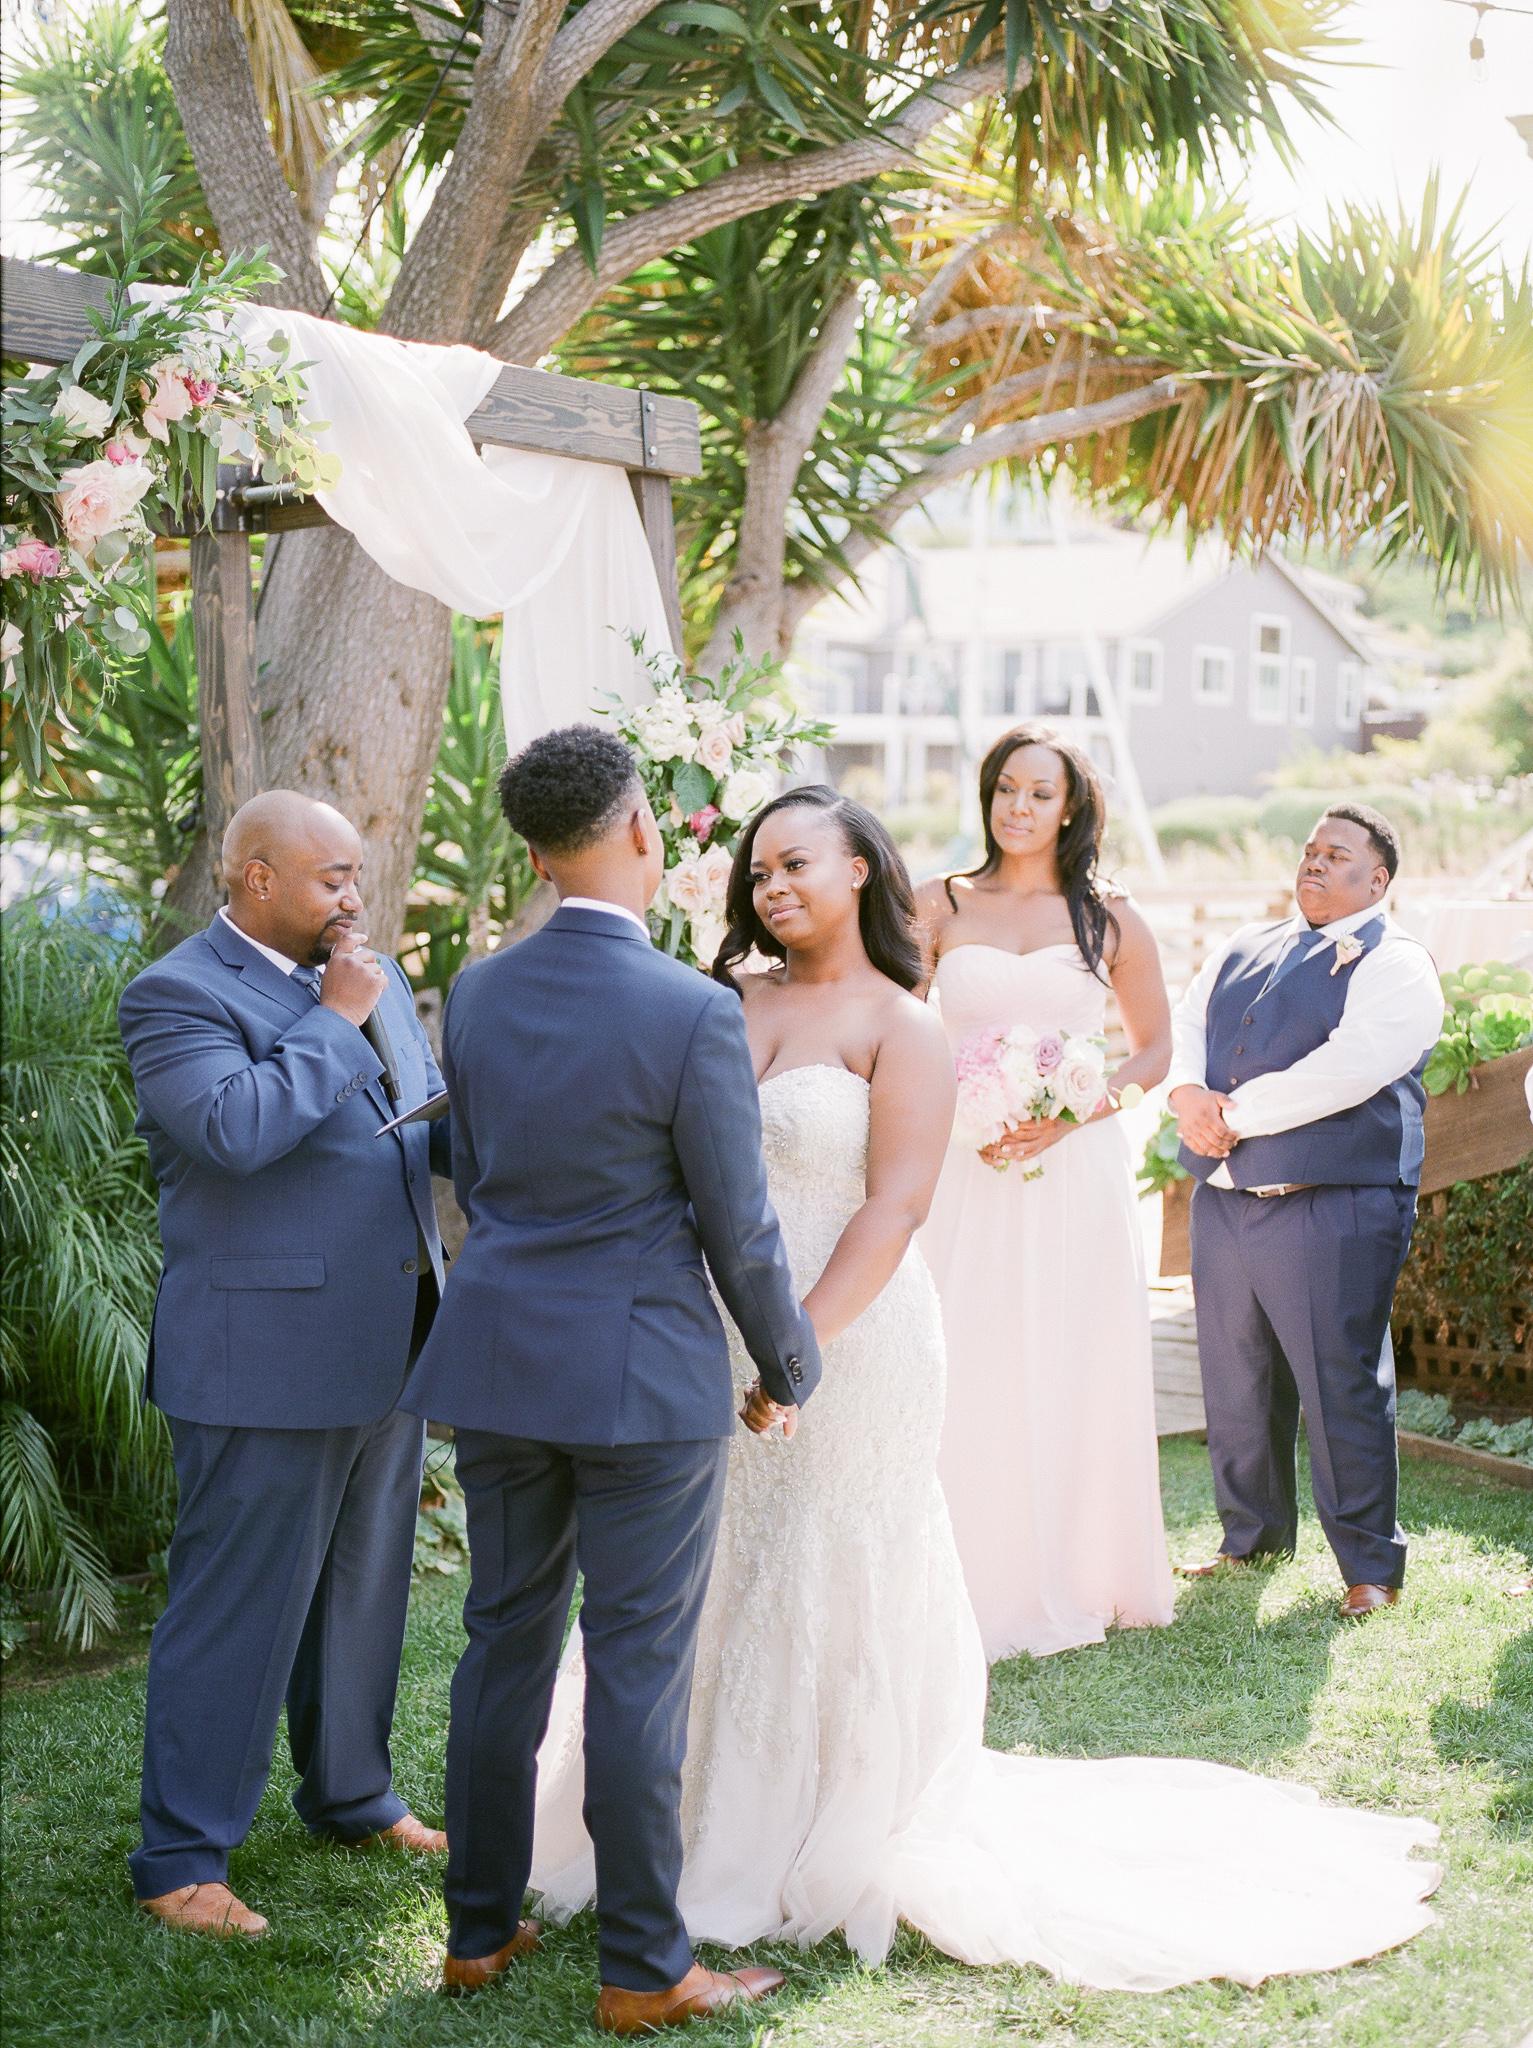 outdoor wedding ceremony vows wooden archway